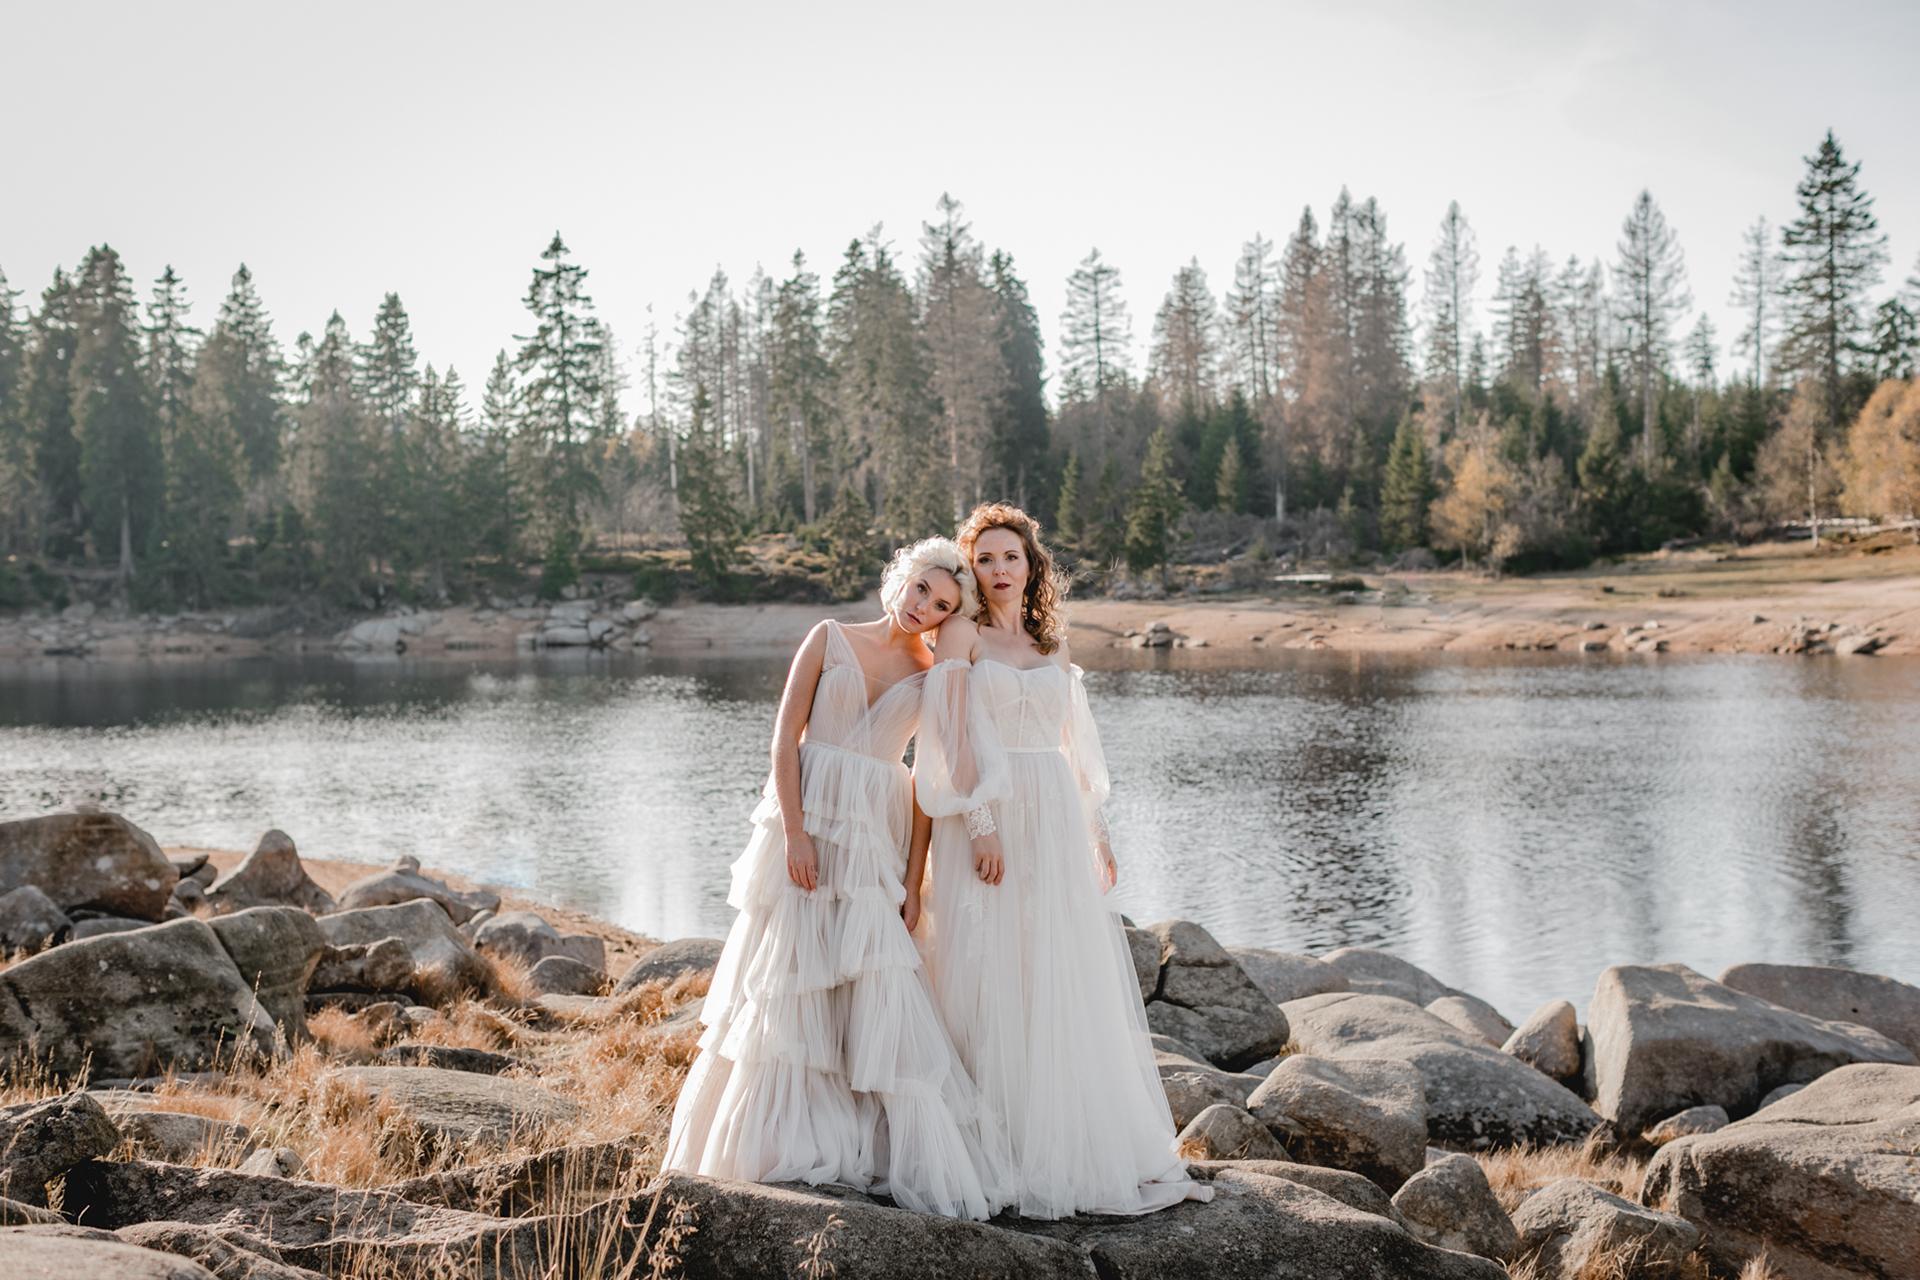 Verspielte vintage Brautkleider - Feelings Braut & Festmoden